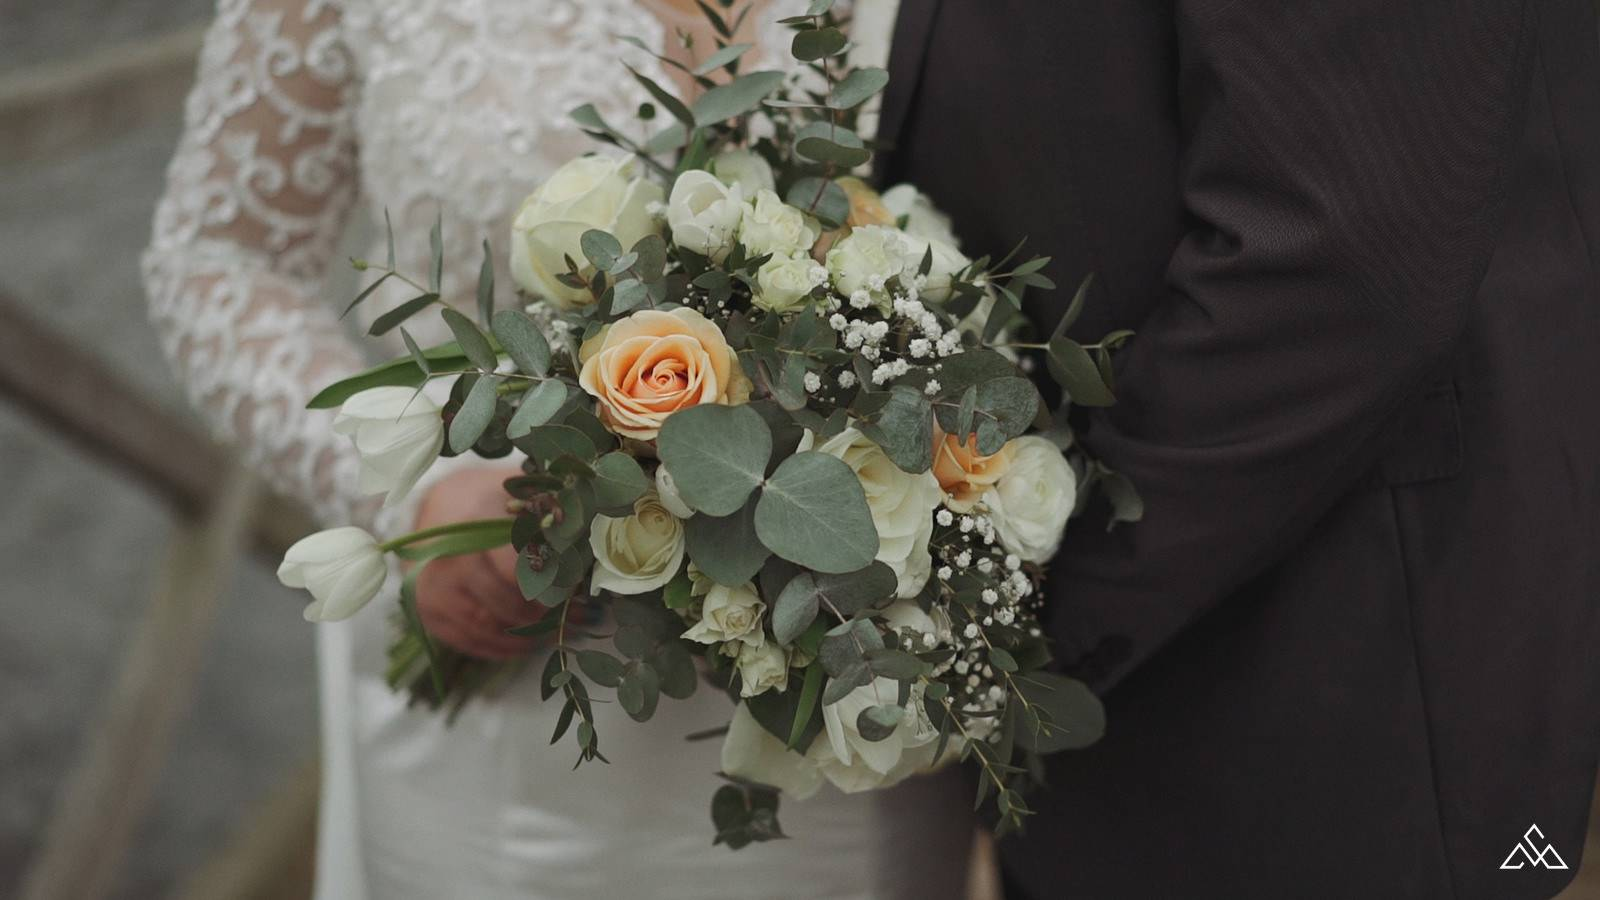 Choose your wedding florist